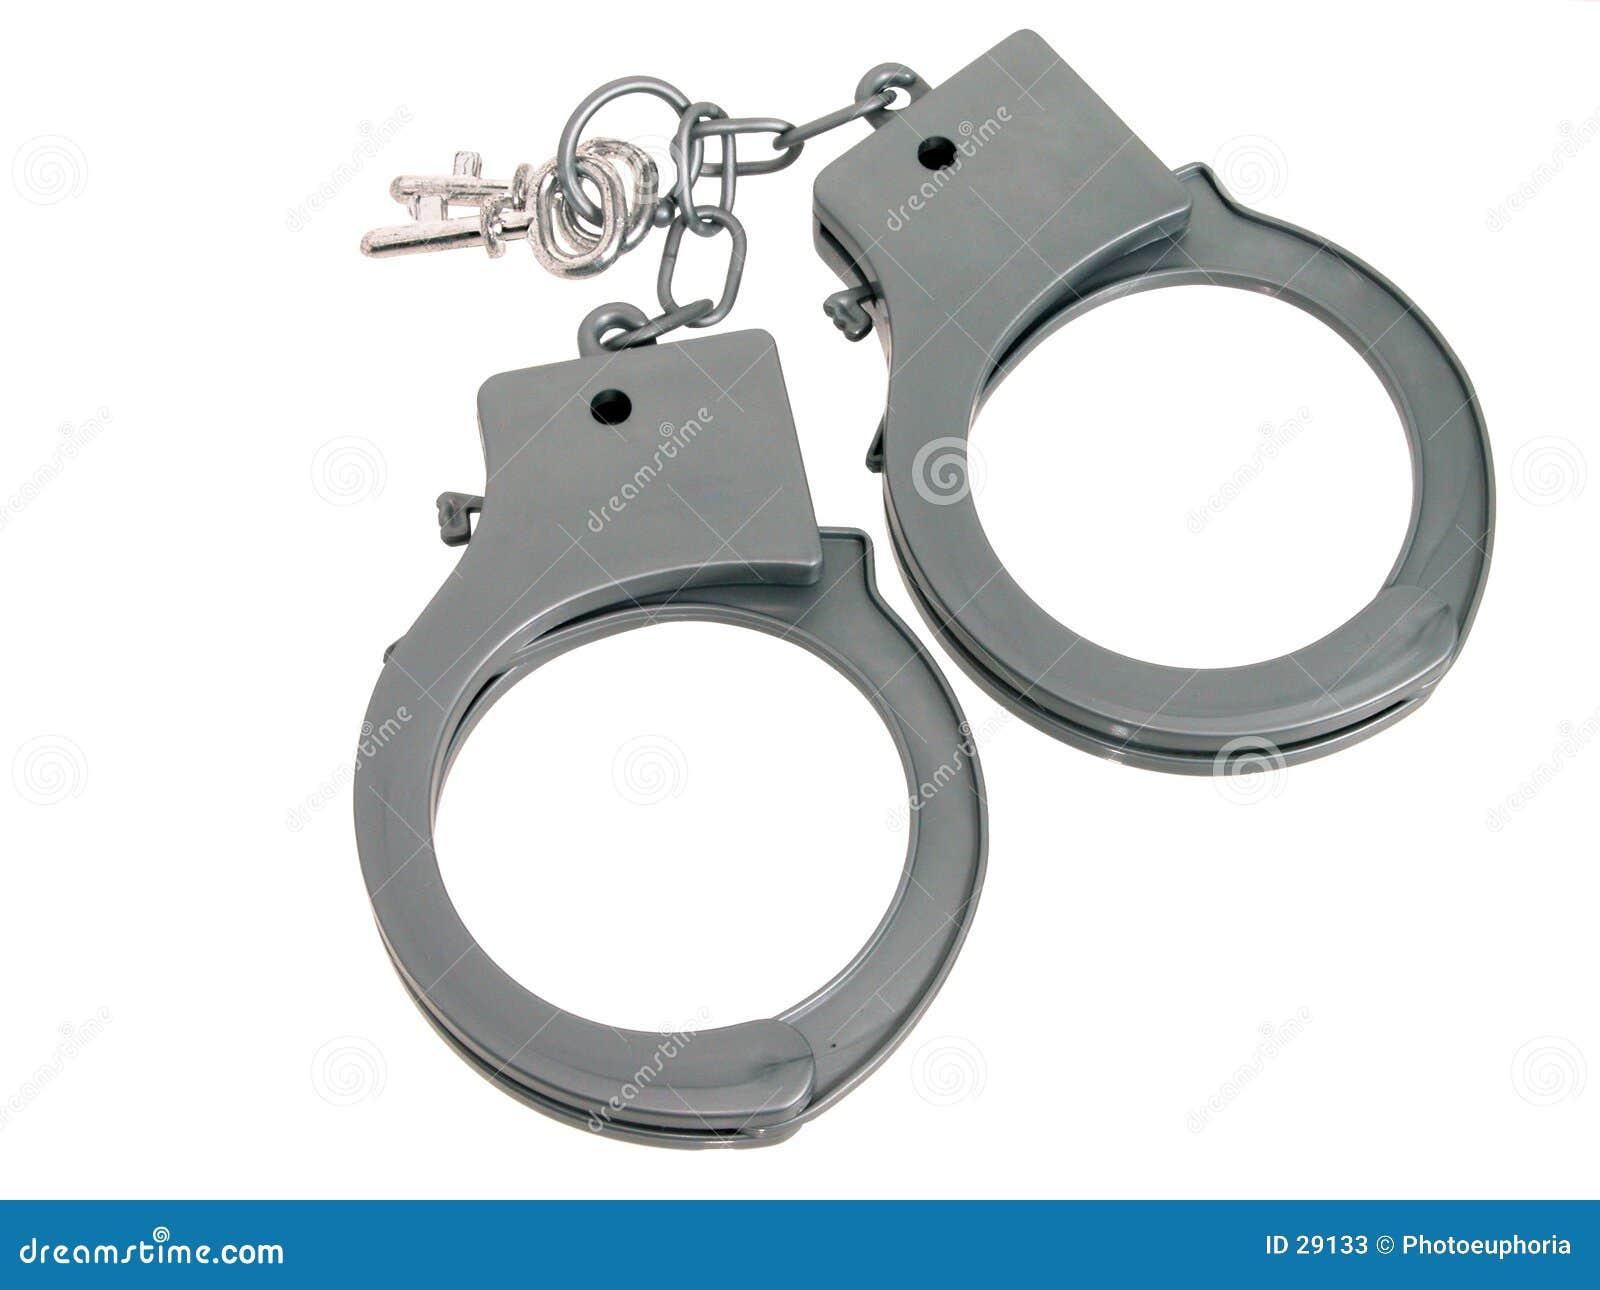 Speelgoed: Plastic Handcuffs